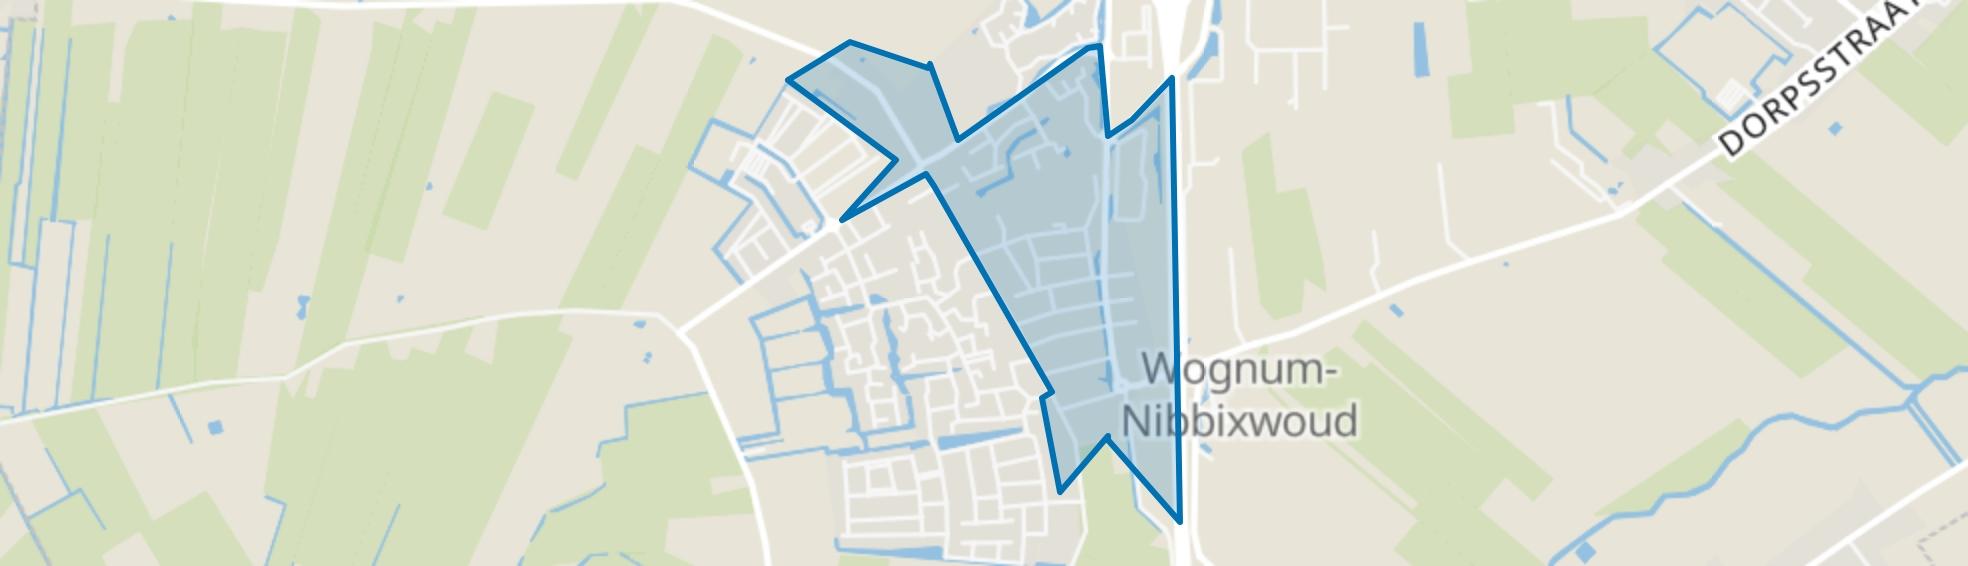 Wognum Centrum, Wognum map